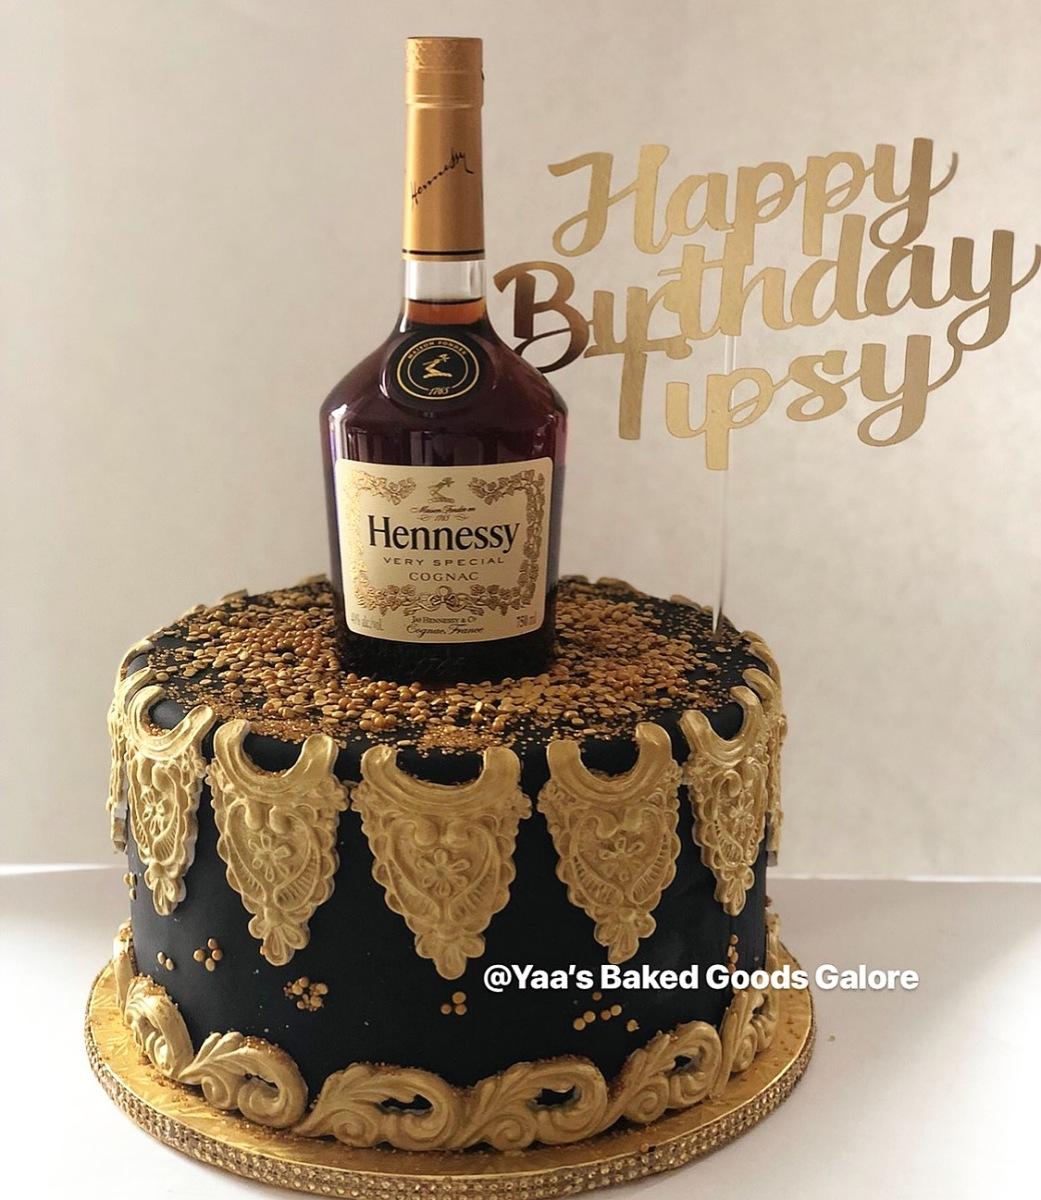 Fantastic 10 Chocolate Custom Cake With Hennessy Bottle On Top Yaas Funny Birthday Cards Online Alyptdamsfinfo